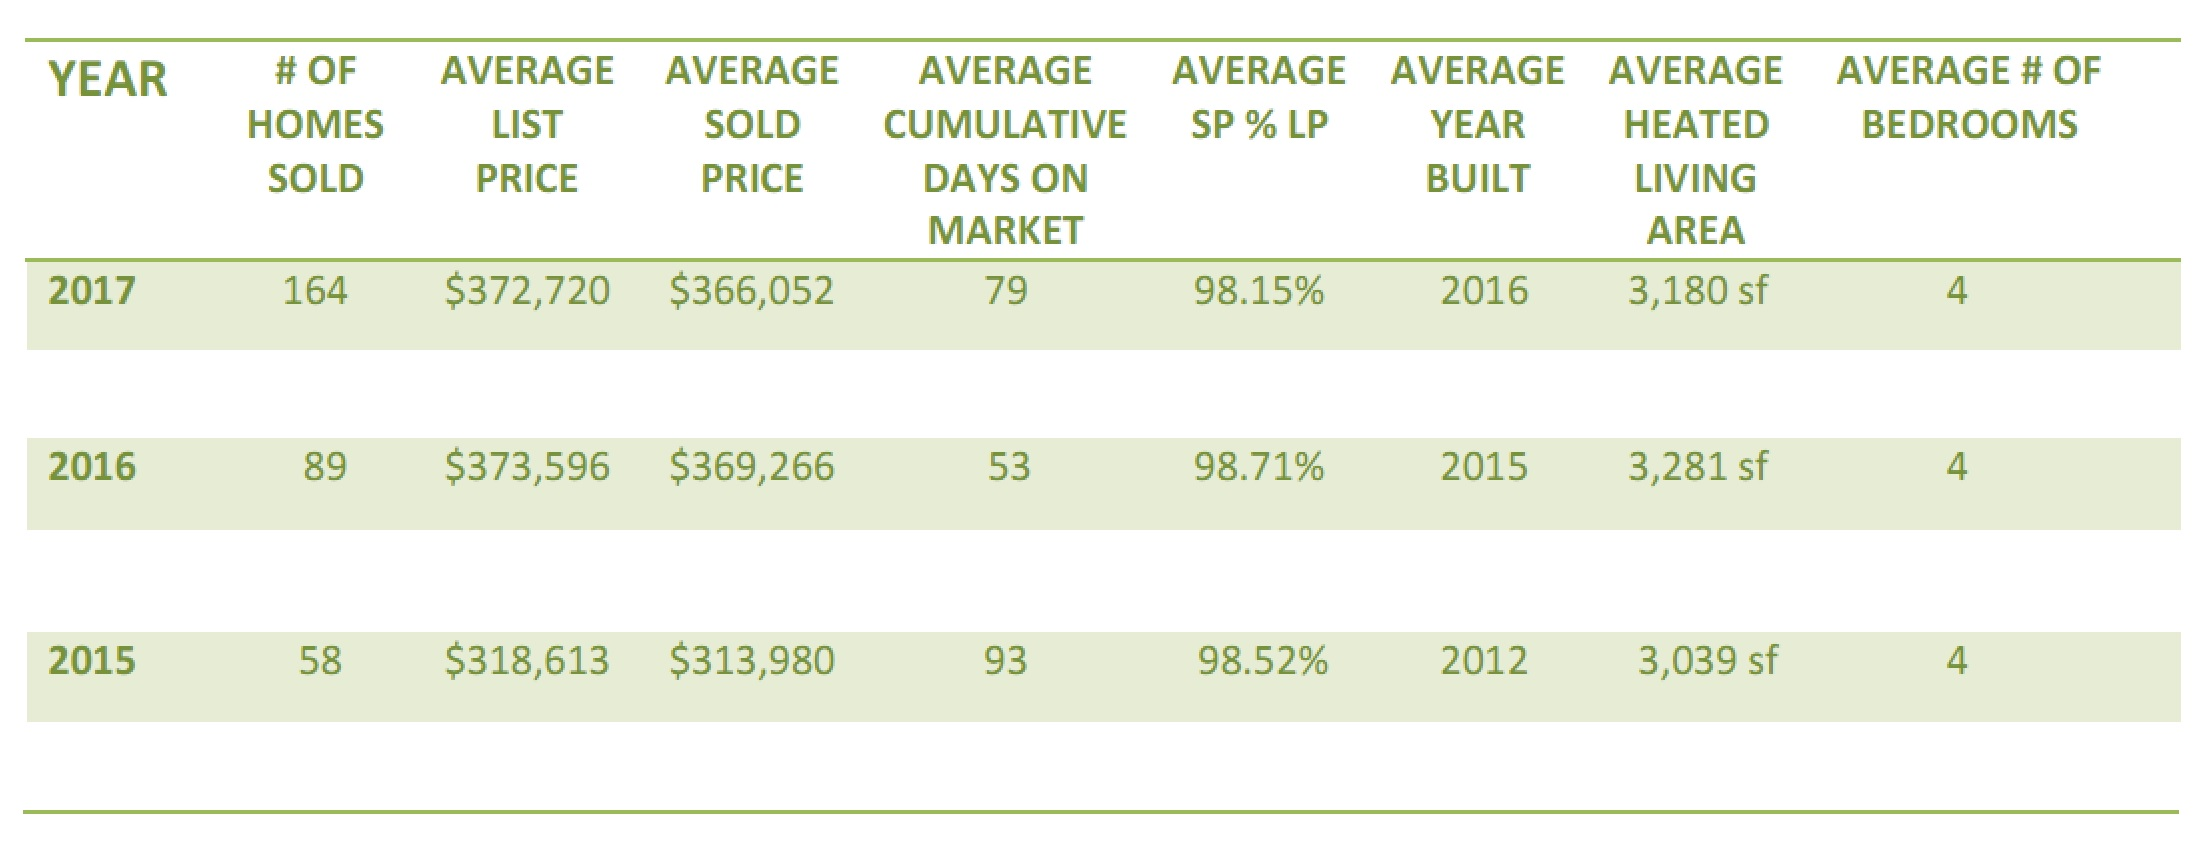 Millbridge community in Waxhaw, NC home sales review 2015-2017